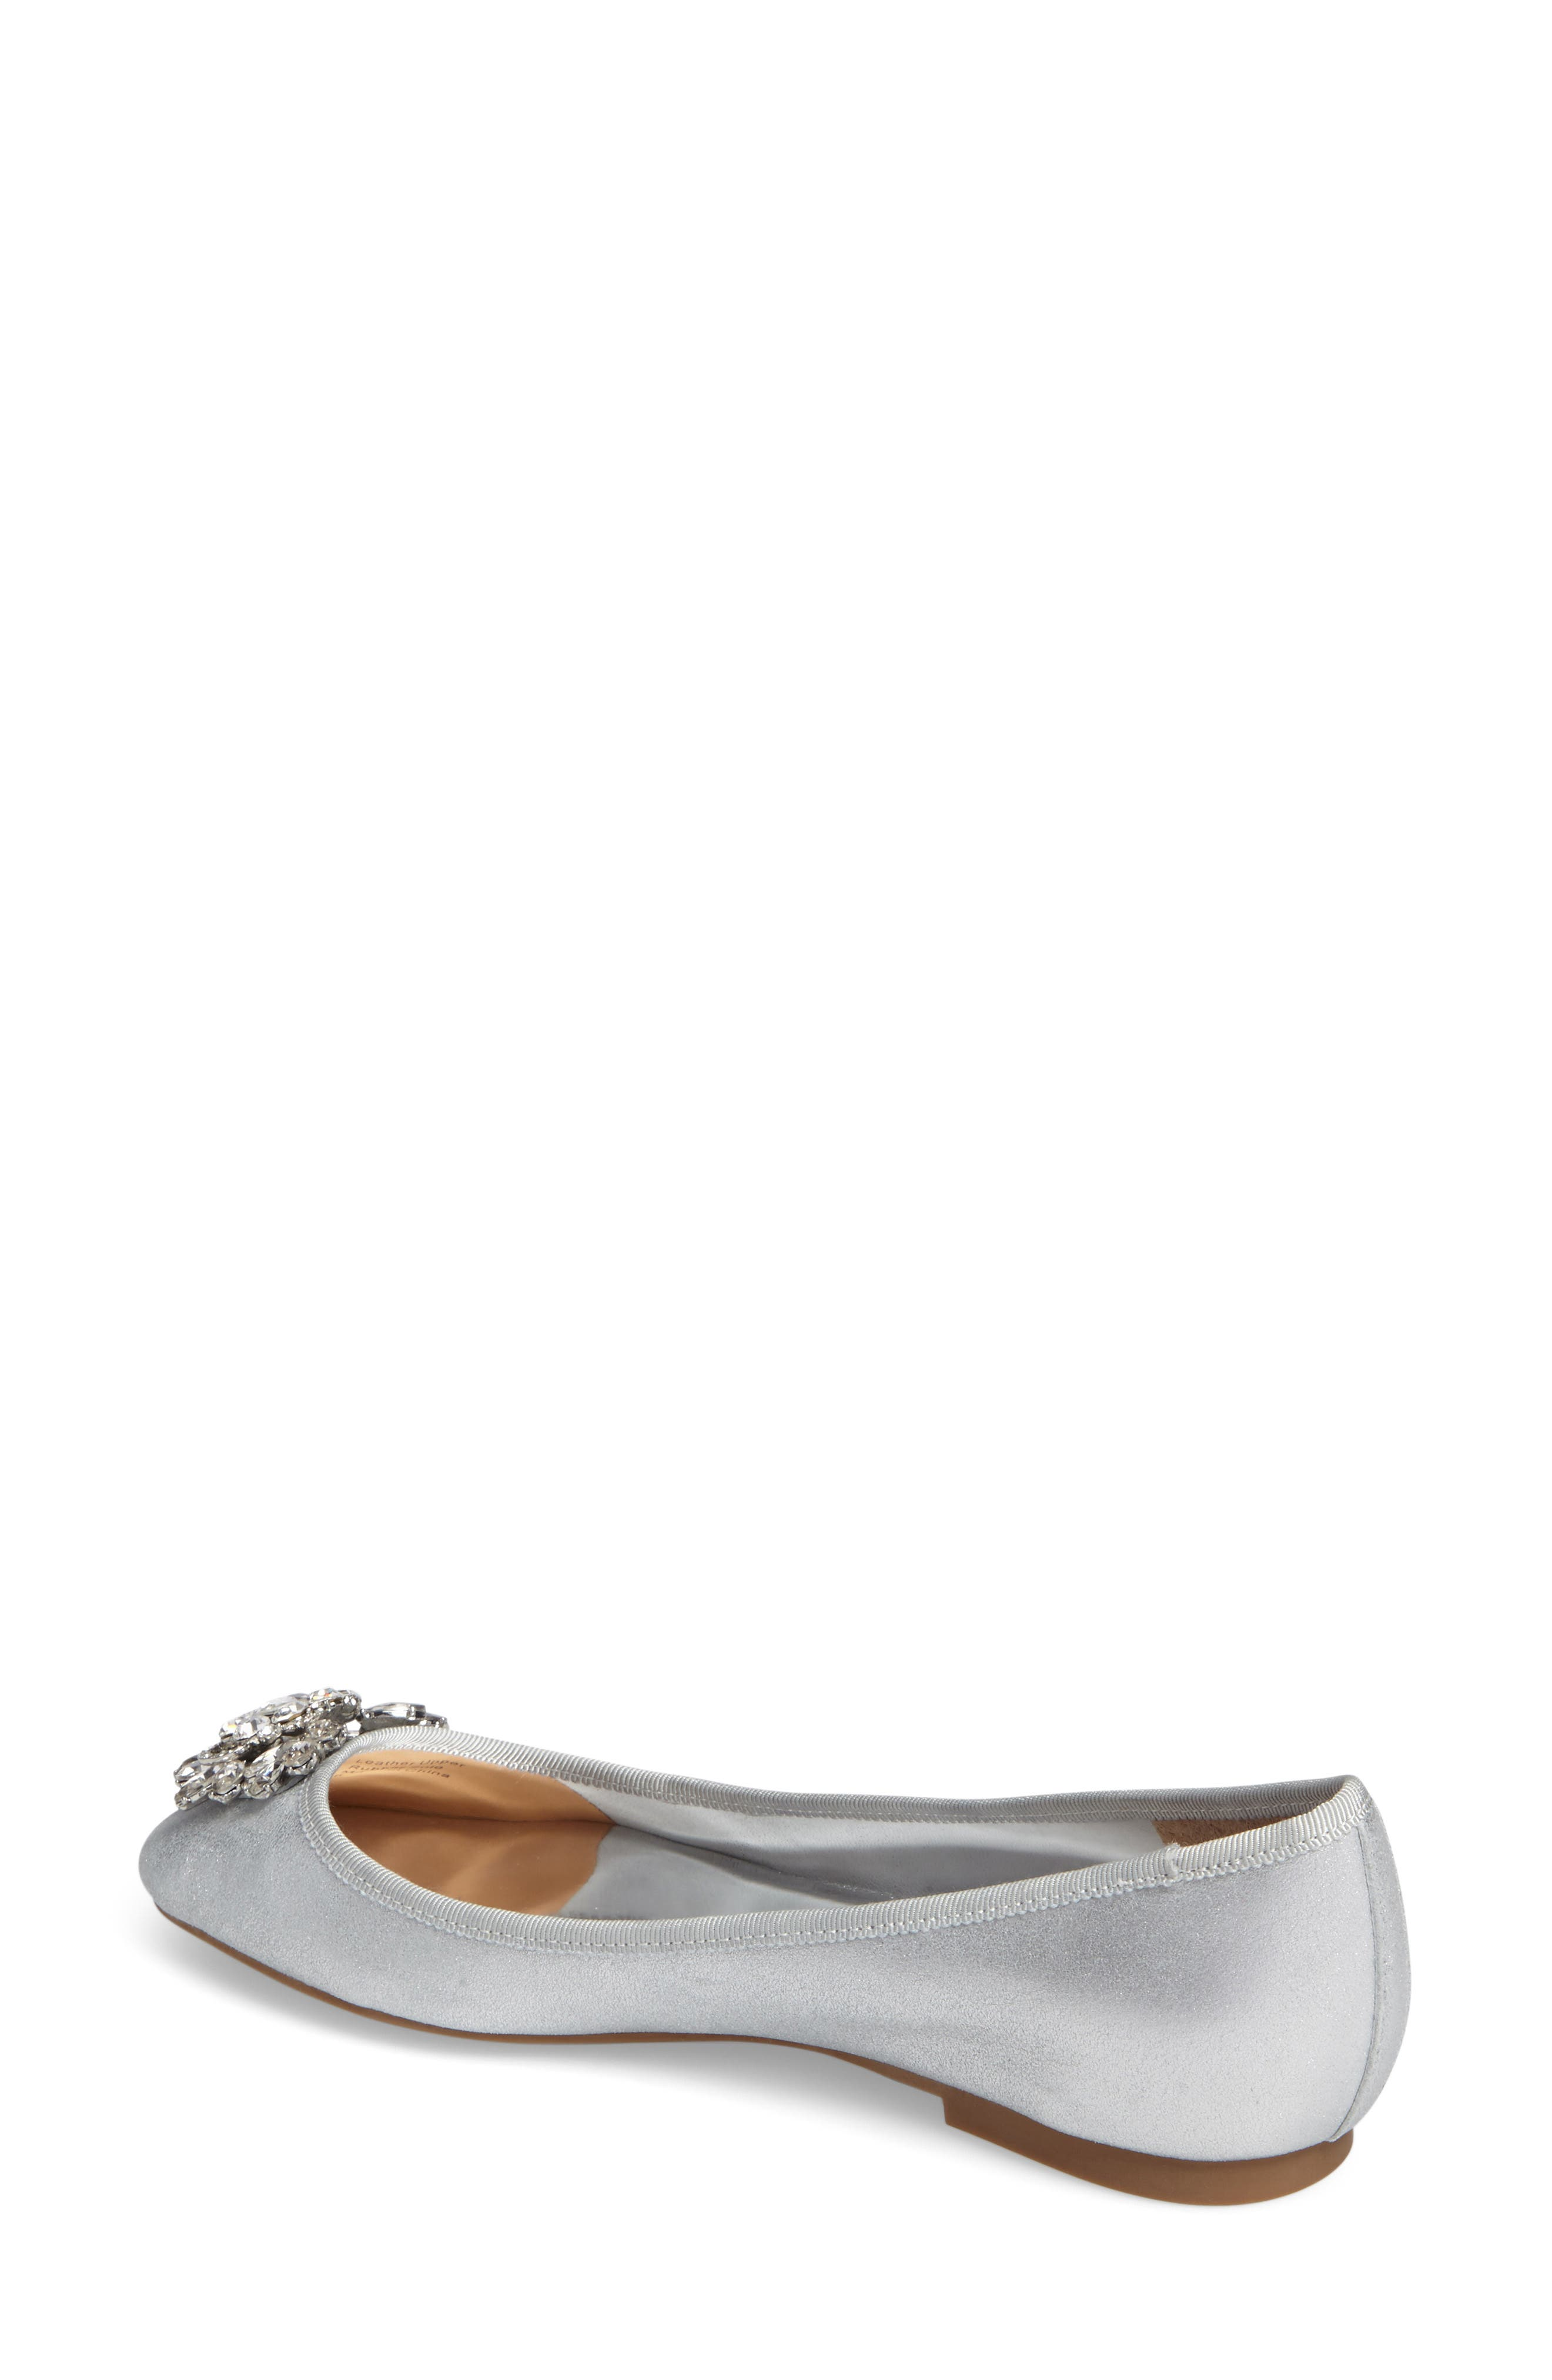 Bianca Embellished Ballet Flat,                             Alternate thumbnail 2, color,                             Silver Metallic Suede